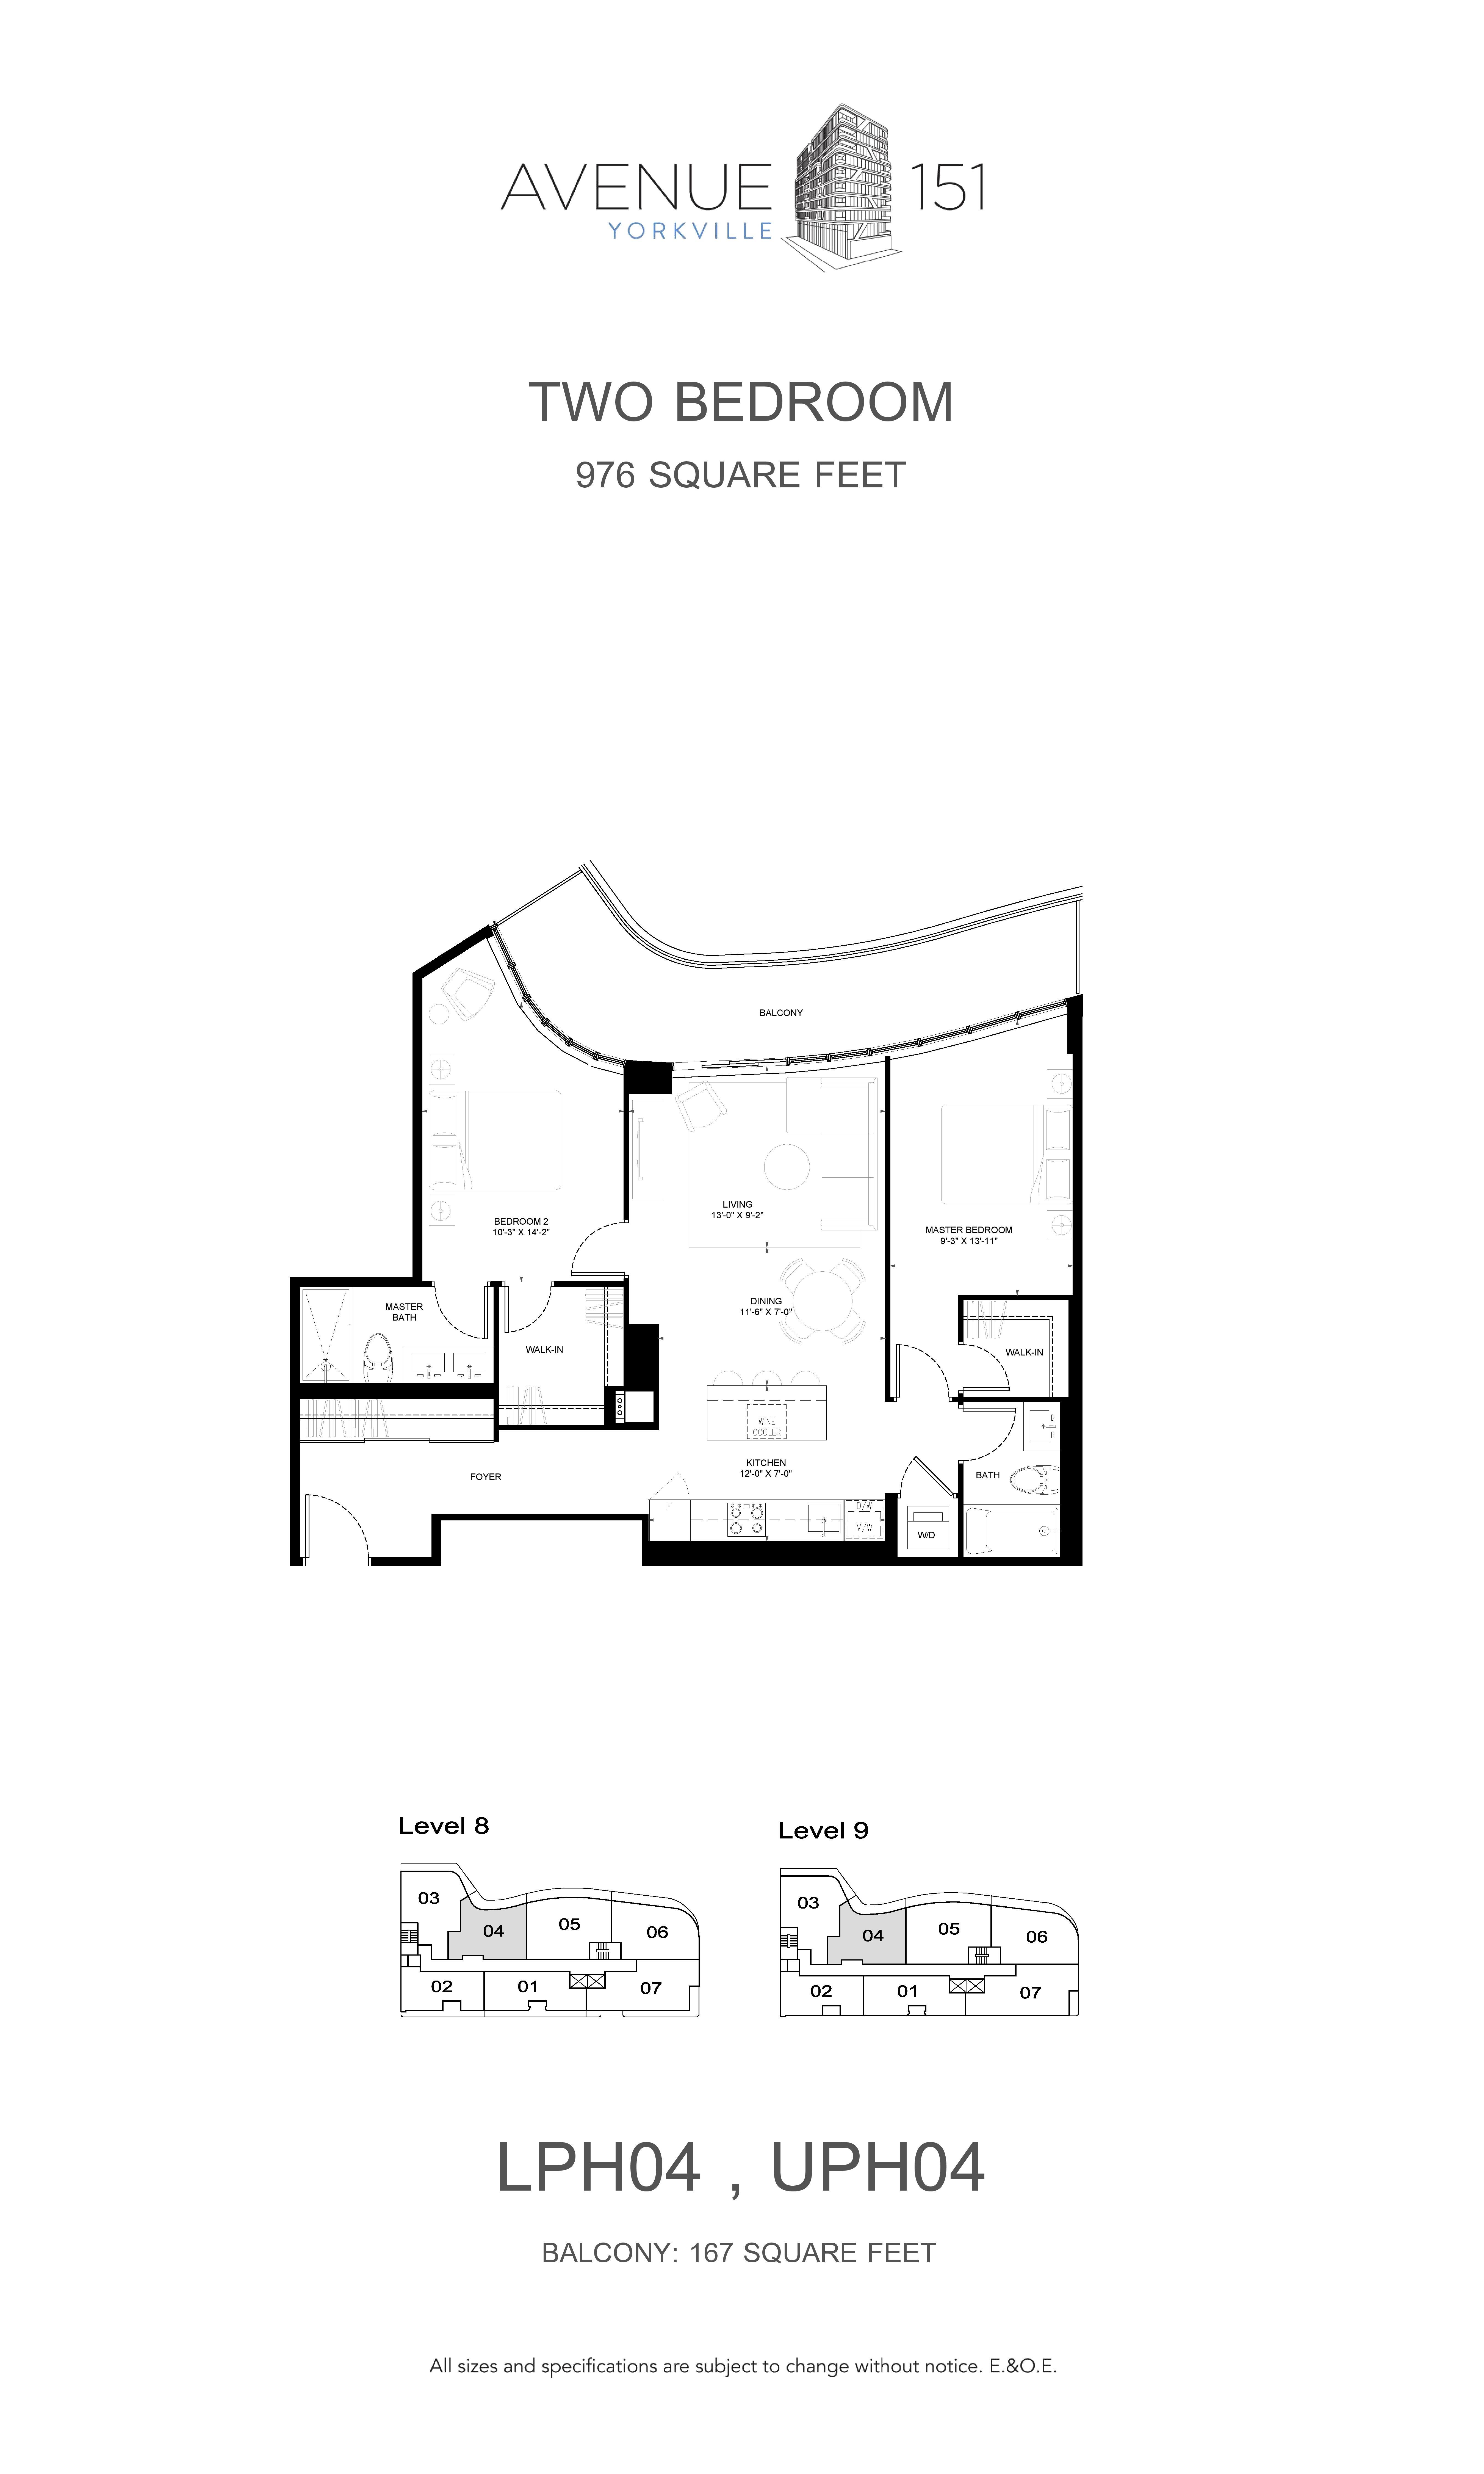 LPH04 Floor Plan at Avenue 151 Yorkville Condos - 976 sq.ft